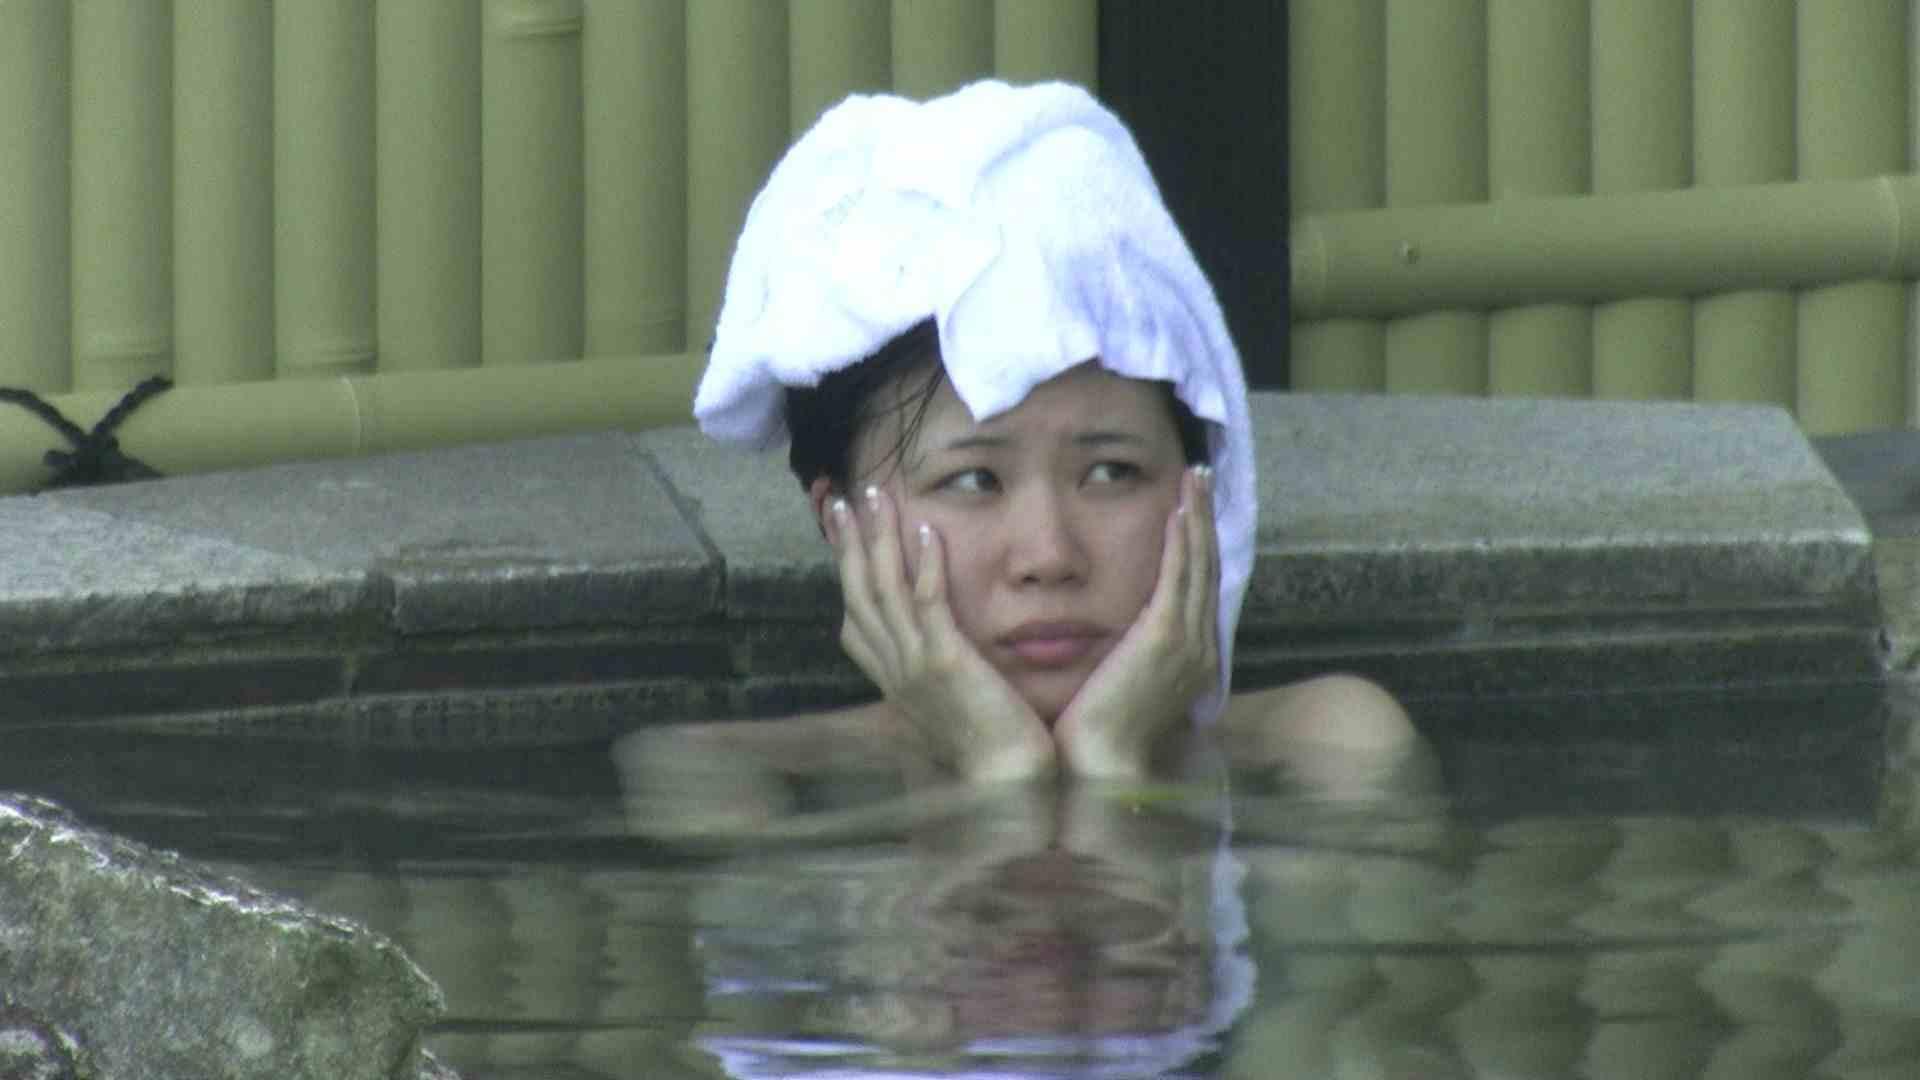 Aquaな露天風呂Vol.183 盗撮 おまんこ無修正動画無料 53枚 47